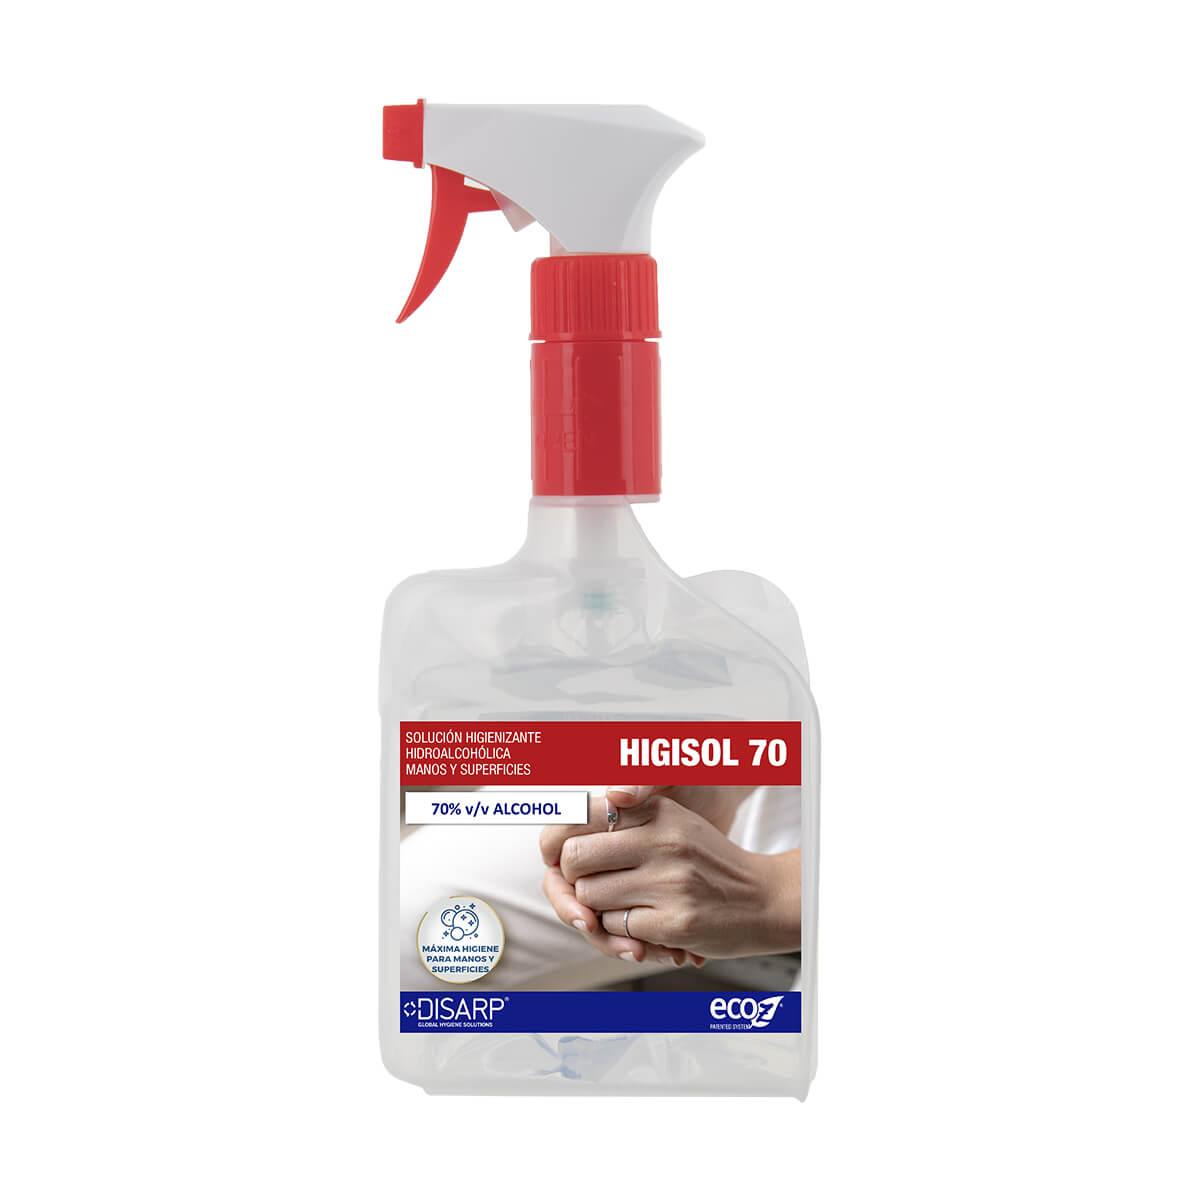 pistola-gel-desinfectante-higisol